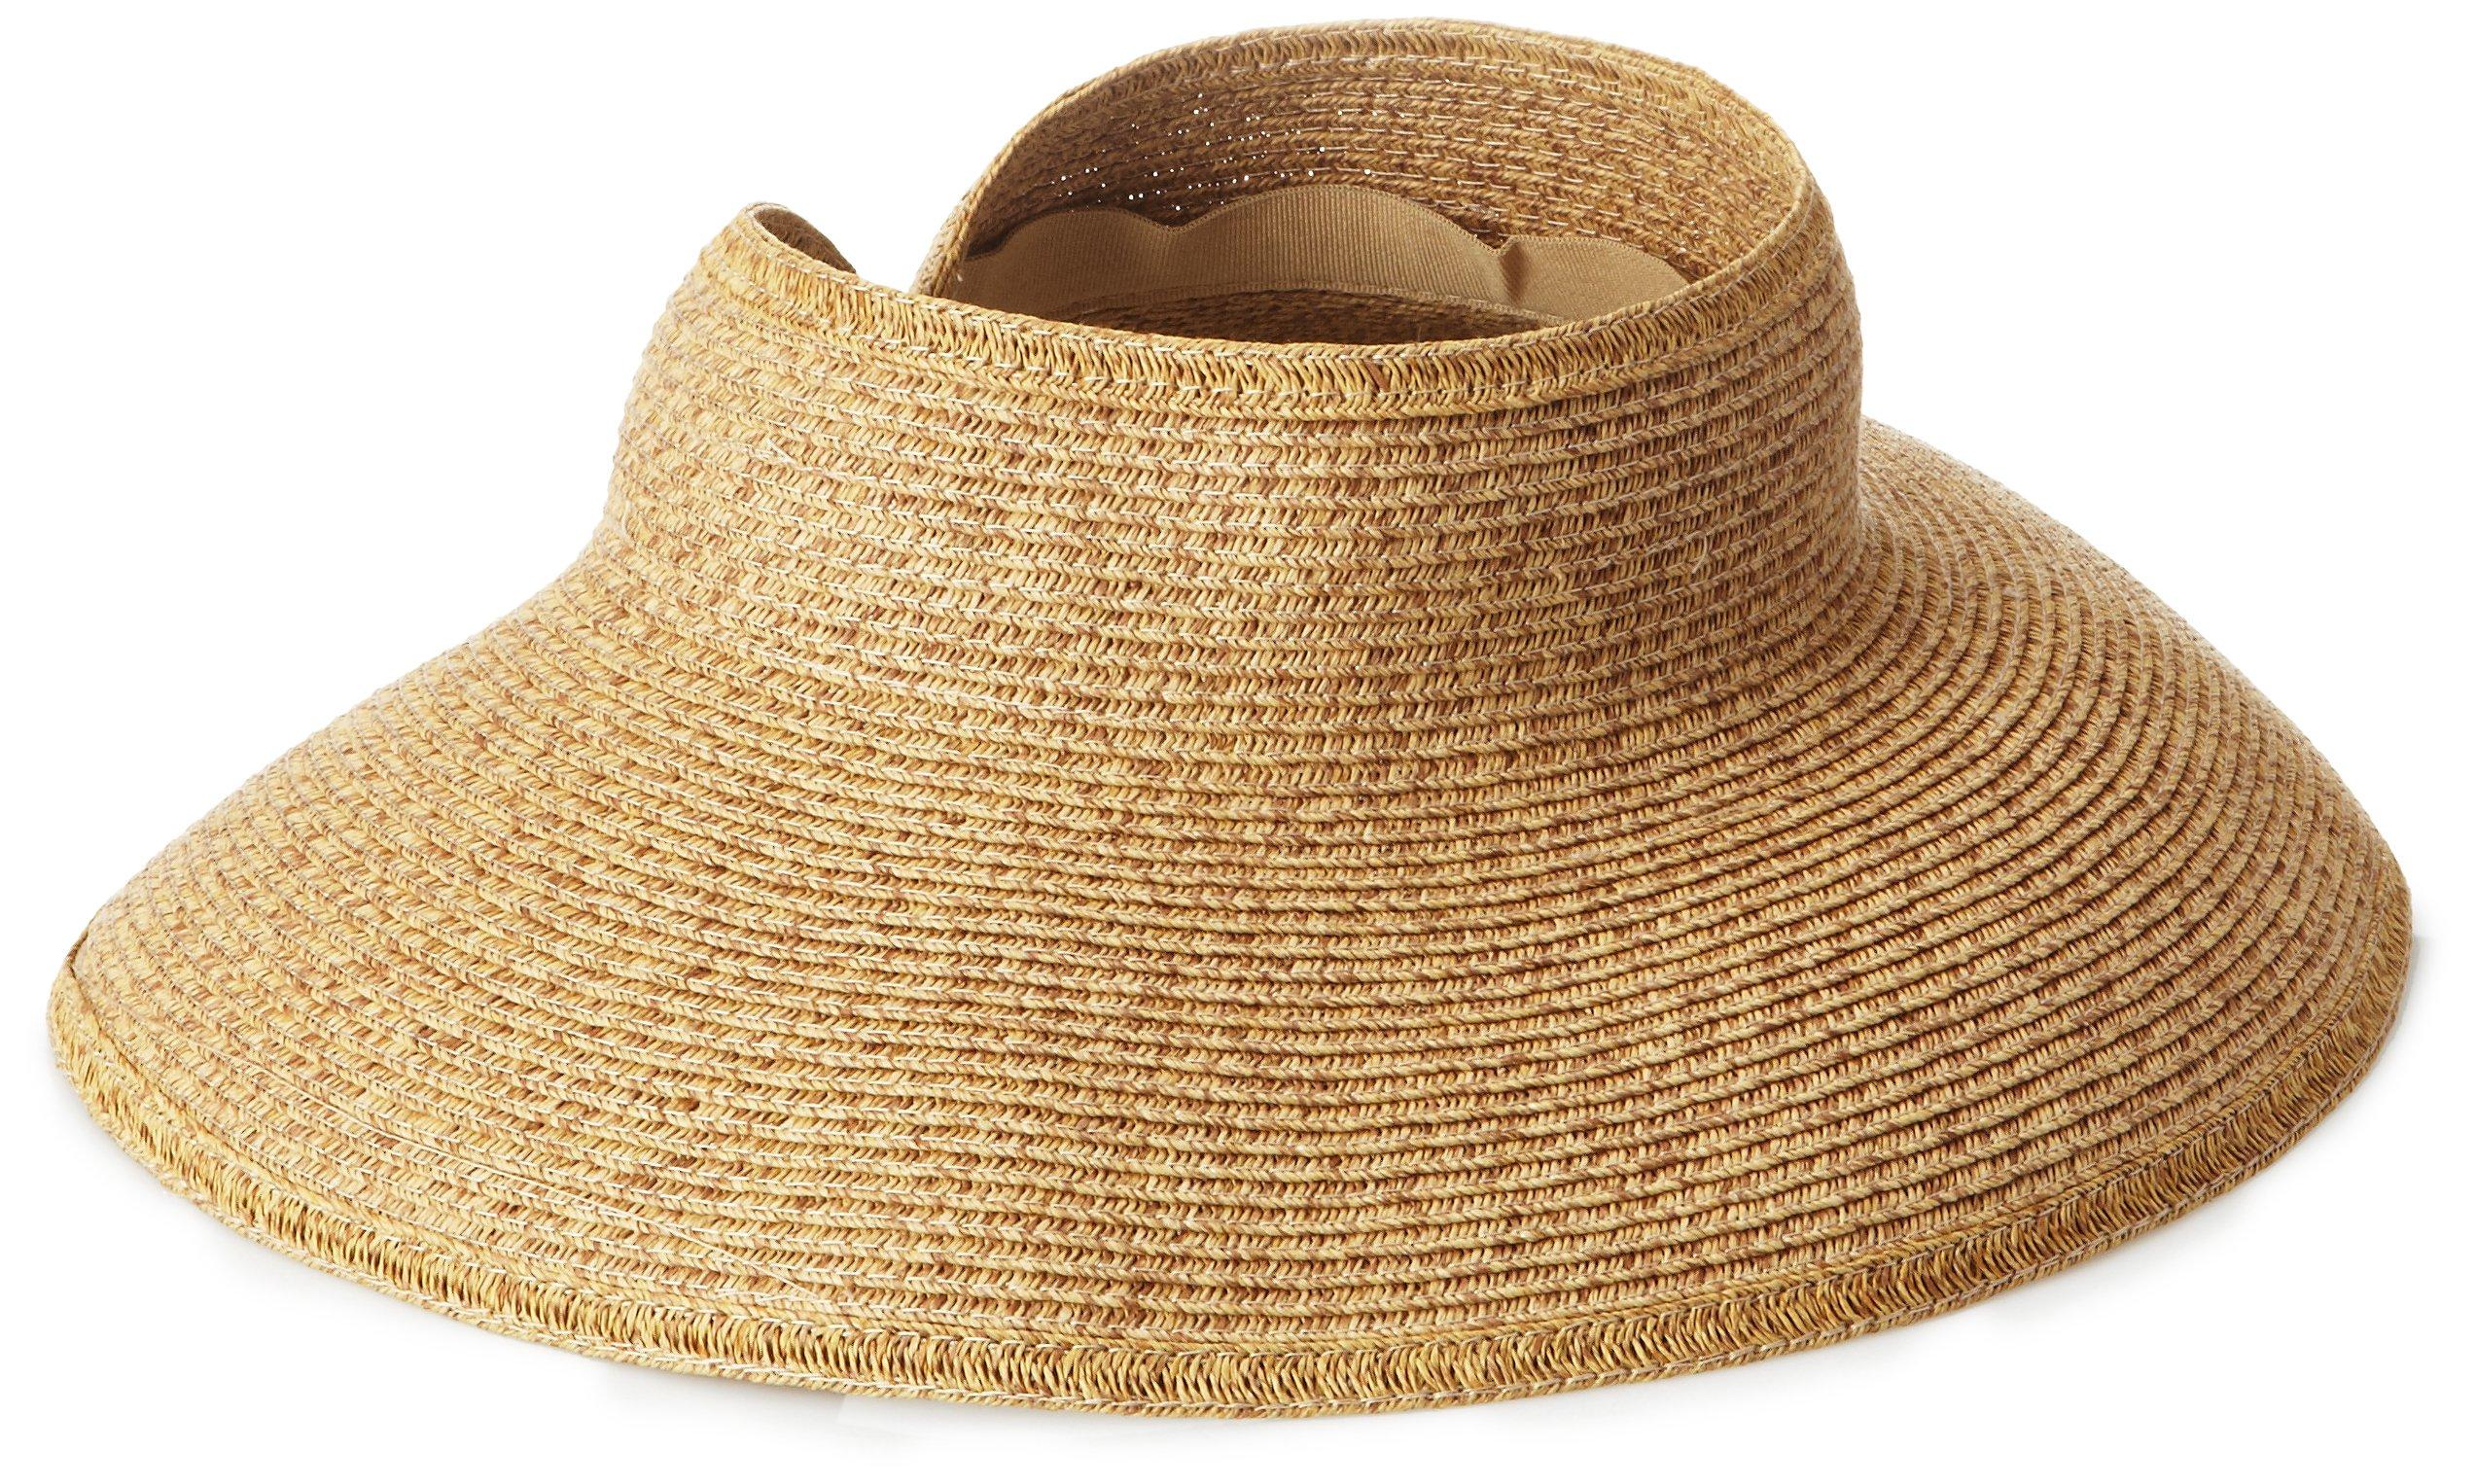 San Diego Hat Company Women's Ultrabraid Visor with Ribbon Binding, and Sweatband, cofeee, One Size by San Diego Hat Company